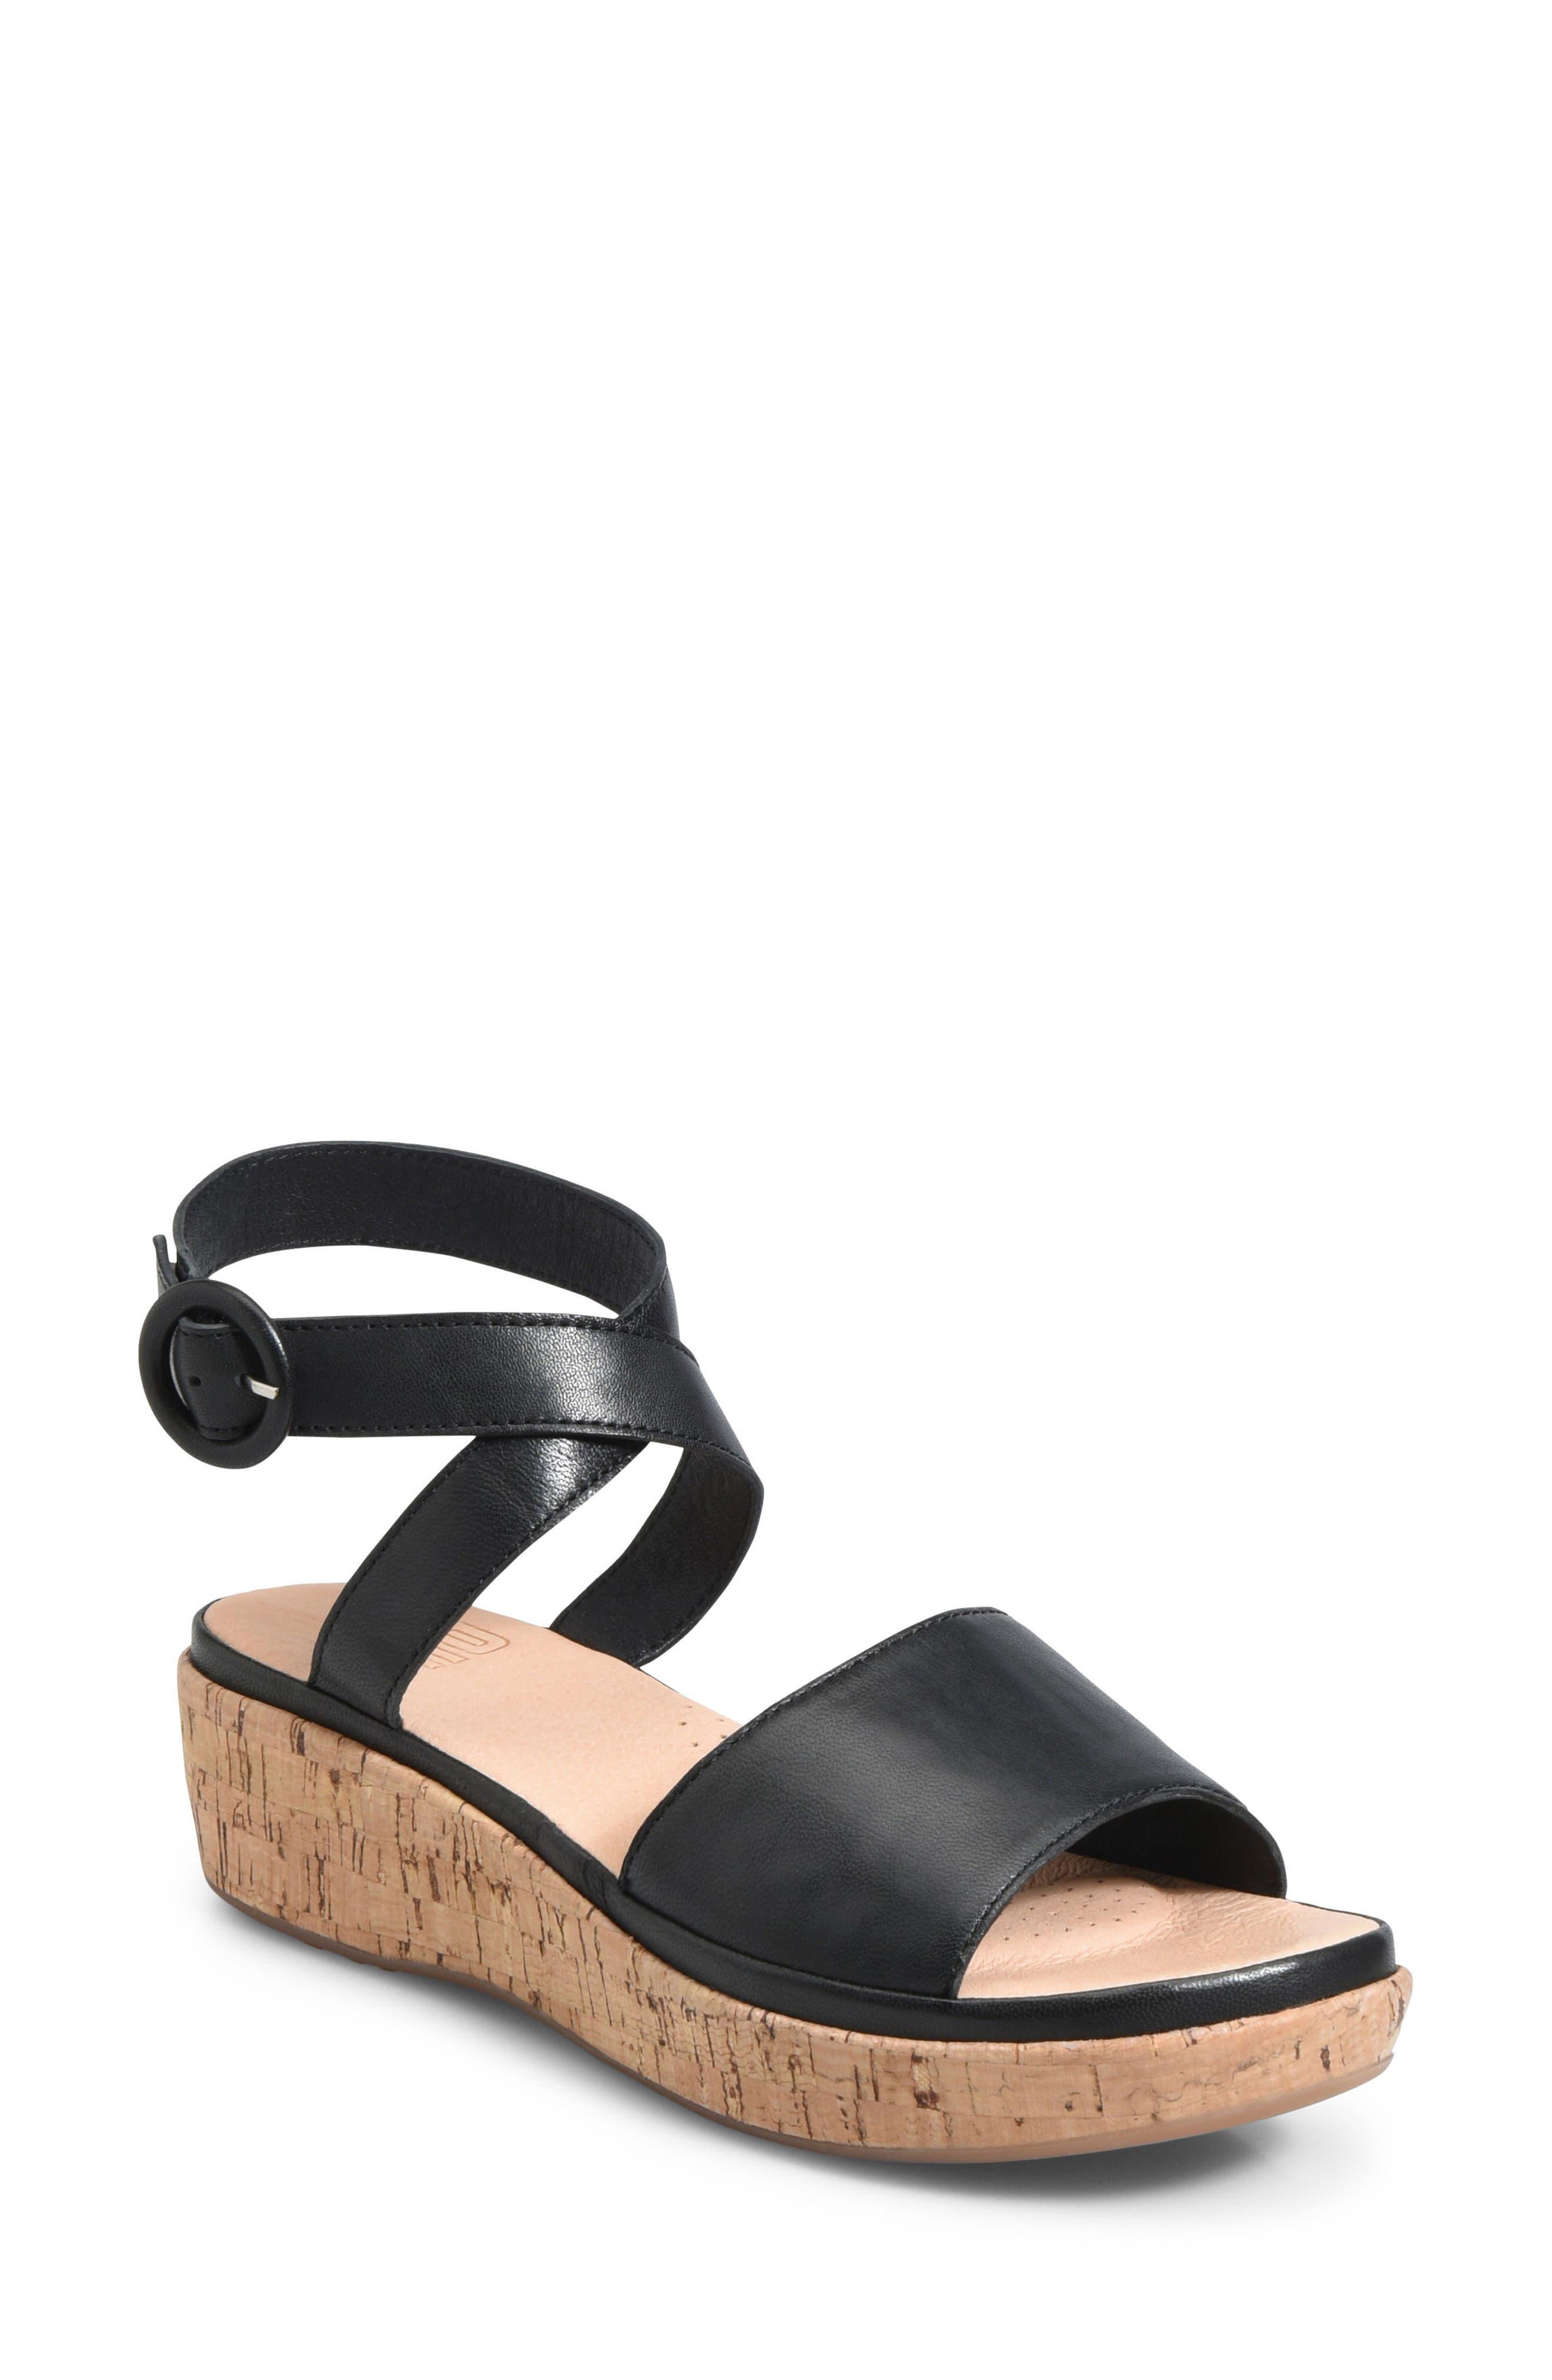 ONO Dreamy Platform Wedge Sandal, Main, color, BLACK LEATHER